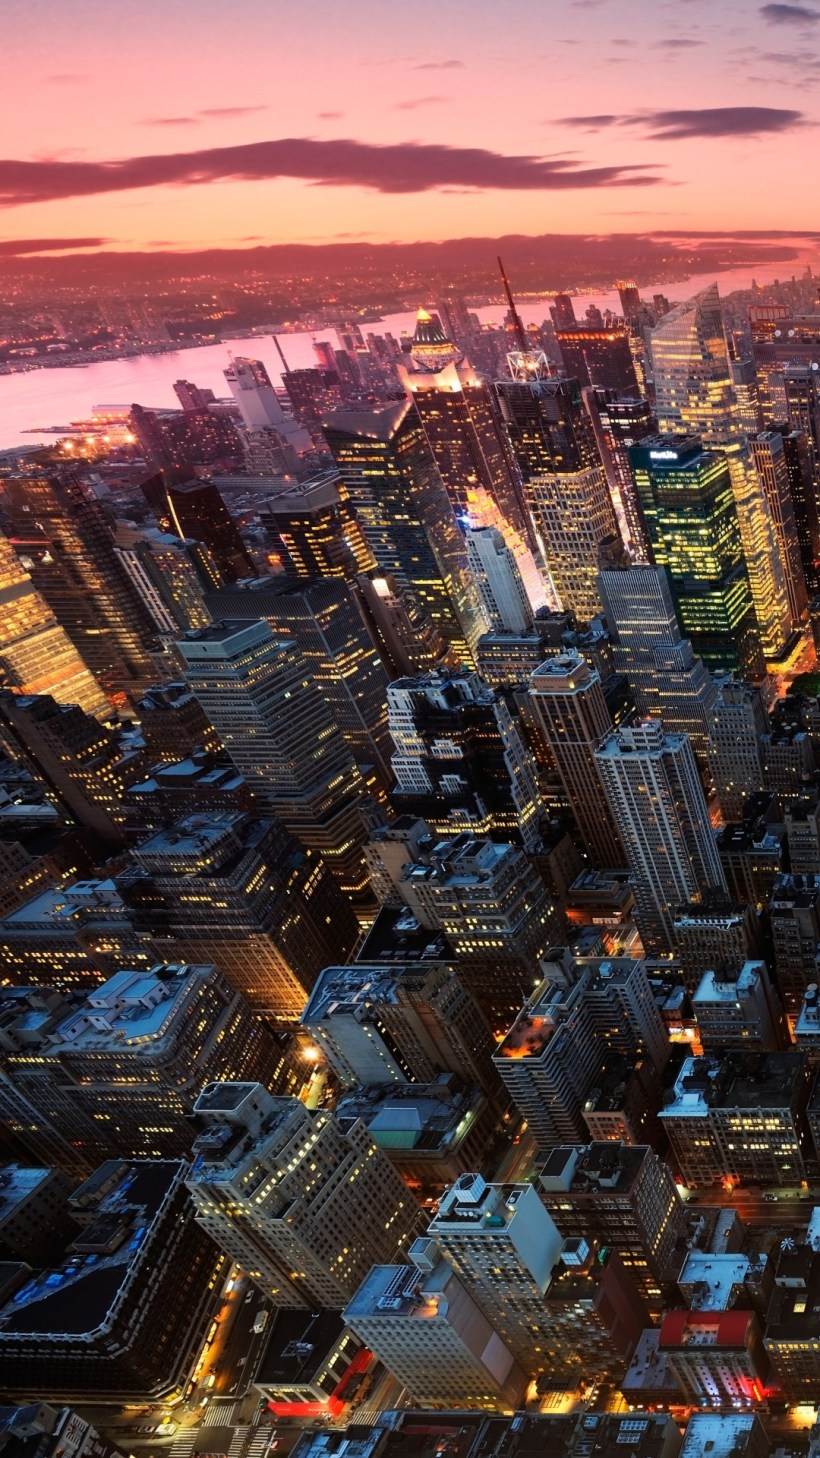 Iphone X New York Wallpaper Hd Vinny Oleo Vegetal Info